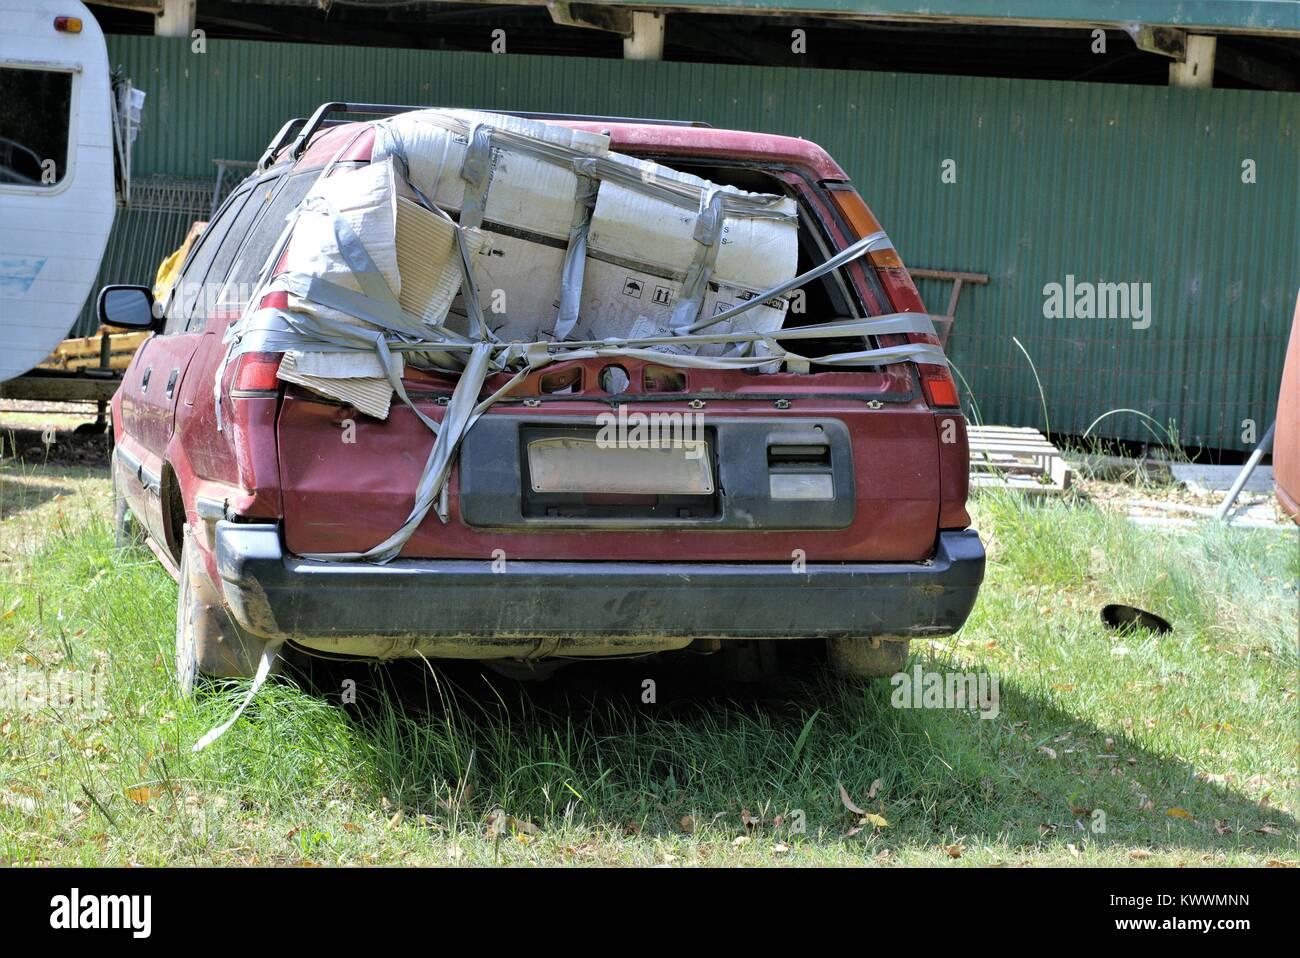 Car junkyard. Wrecked car junk yard in Australia Stock Photo